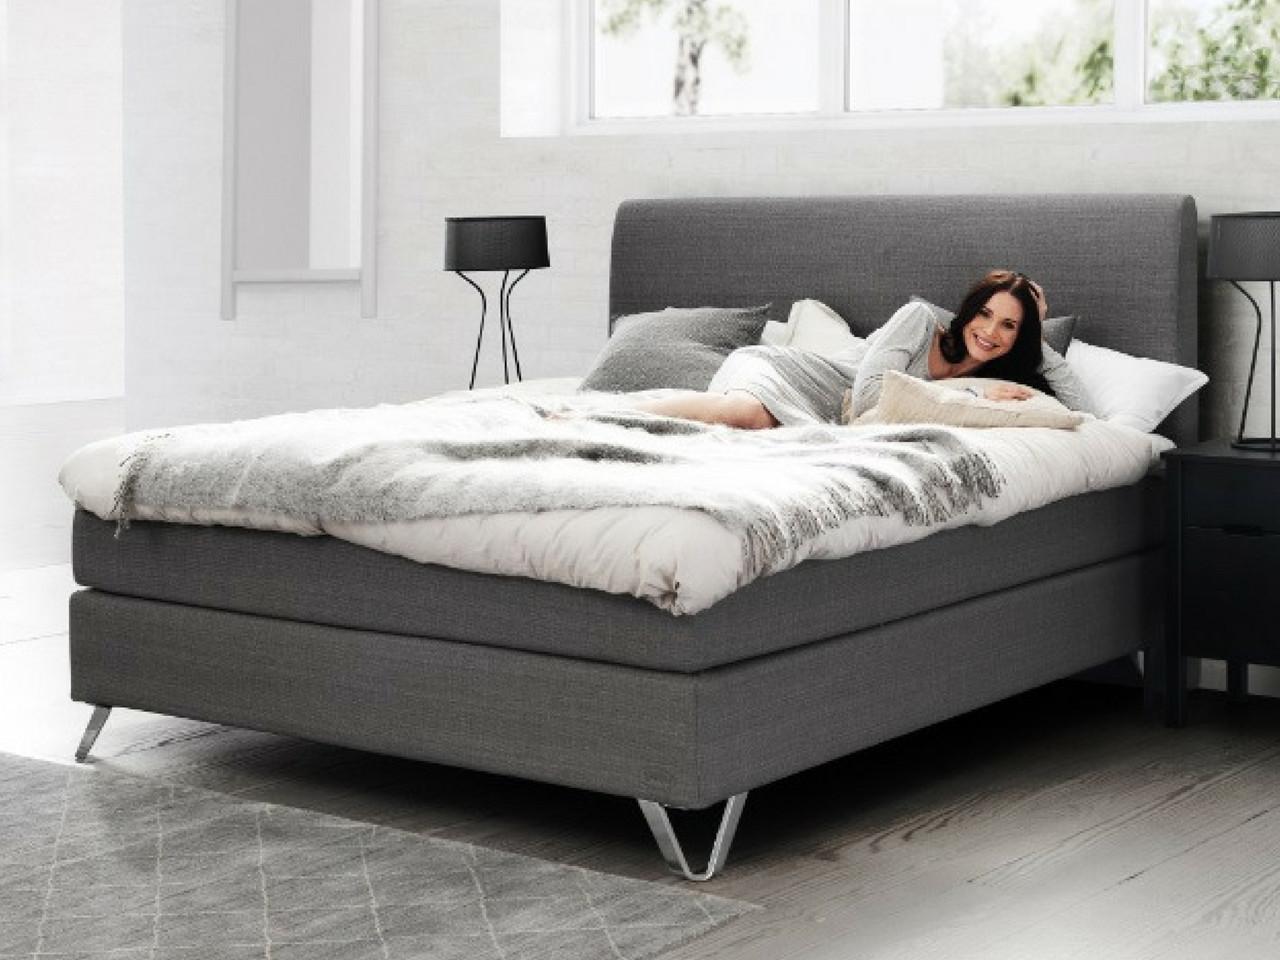 jensen senge Jensen Senge   Køb senge fra Jensen her jensen senge